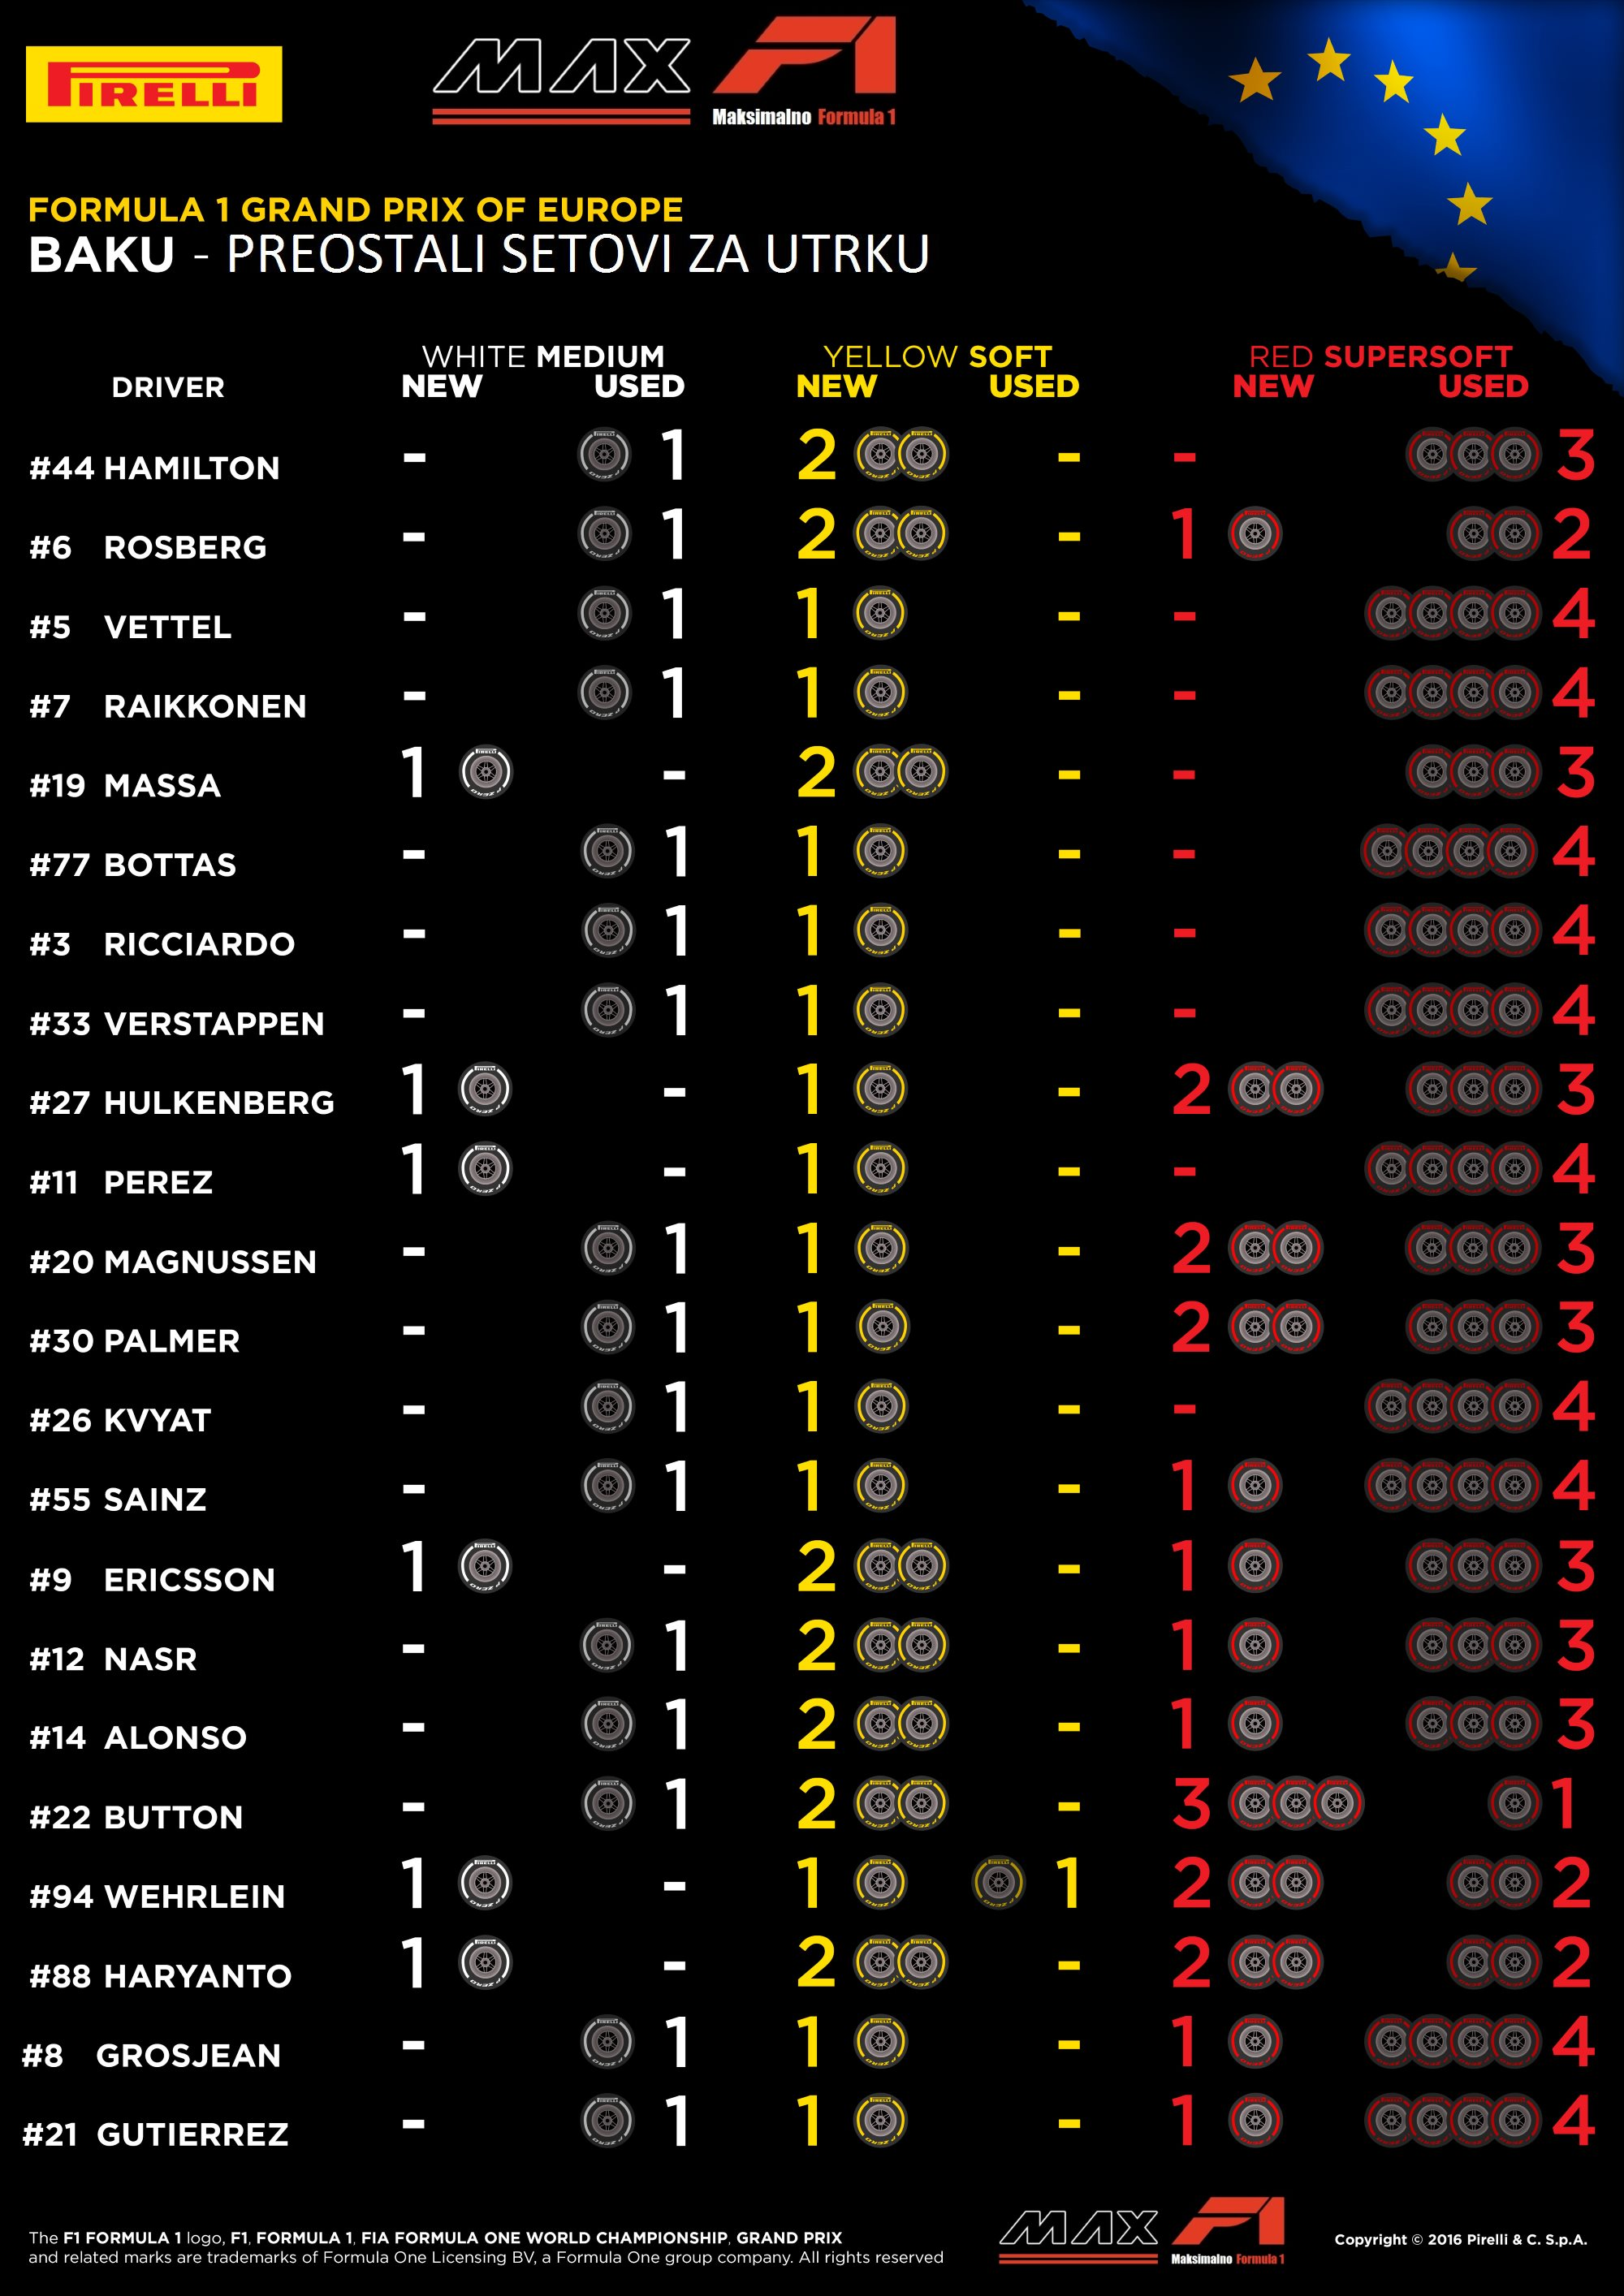 European GP Baku F1 2016 Pirelli tyres avalaible for the race